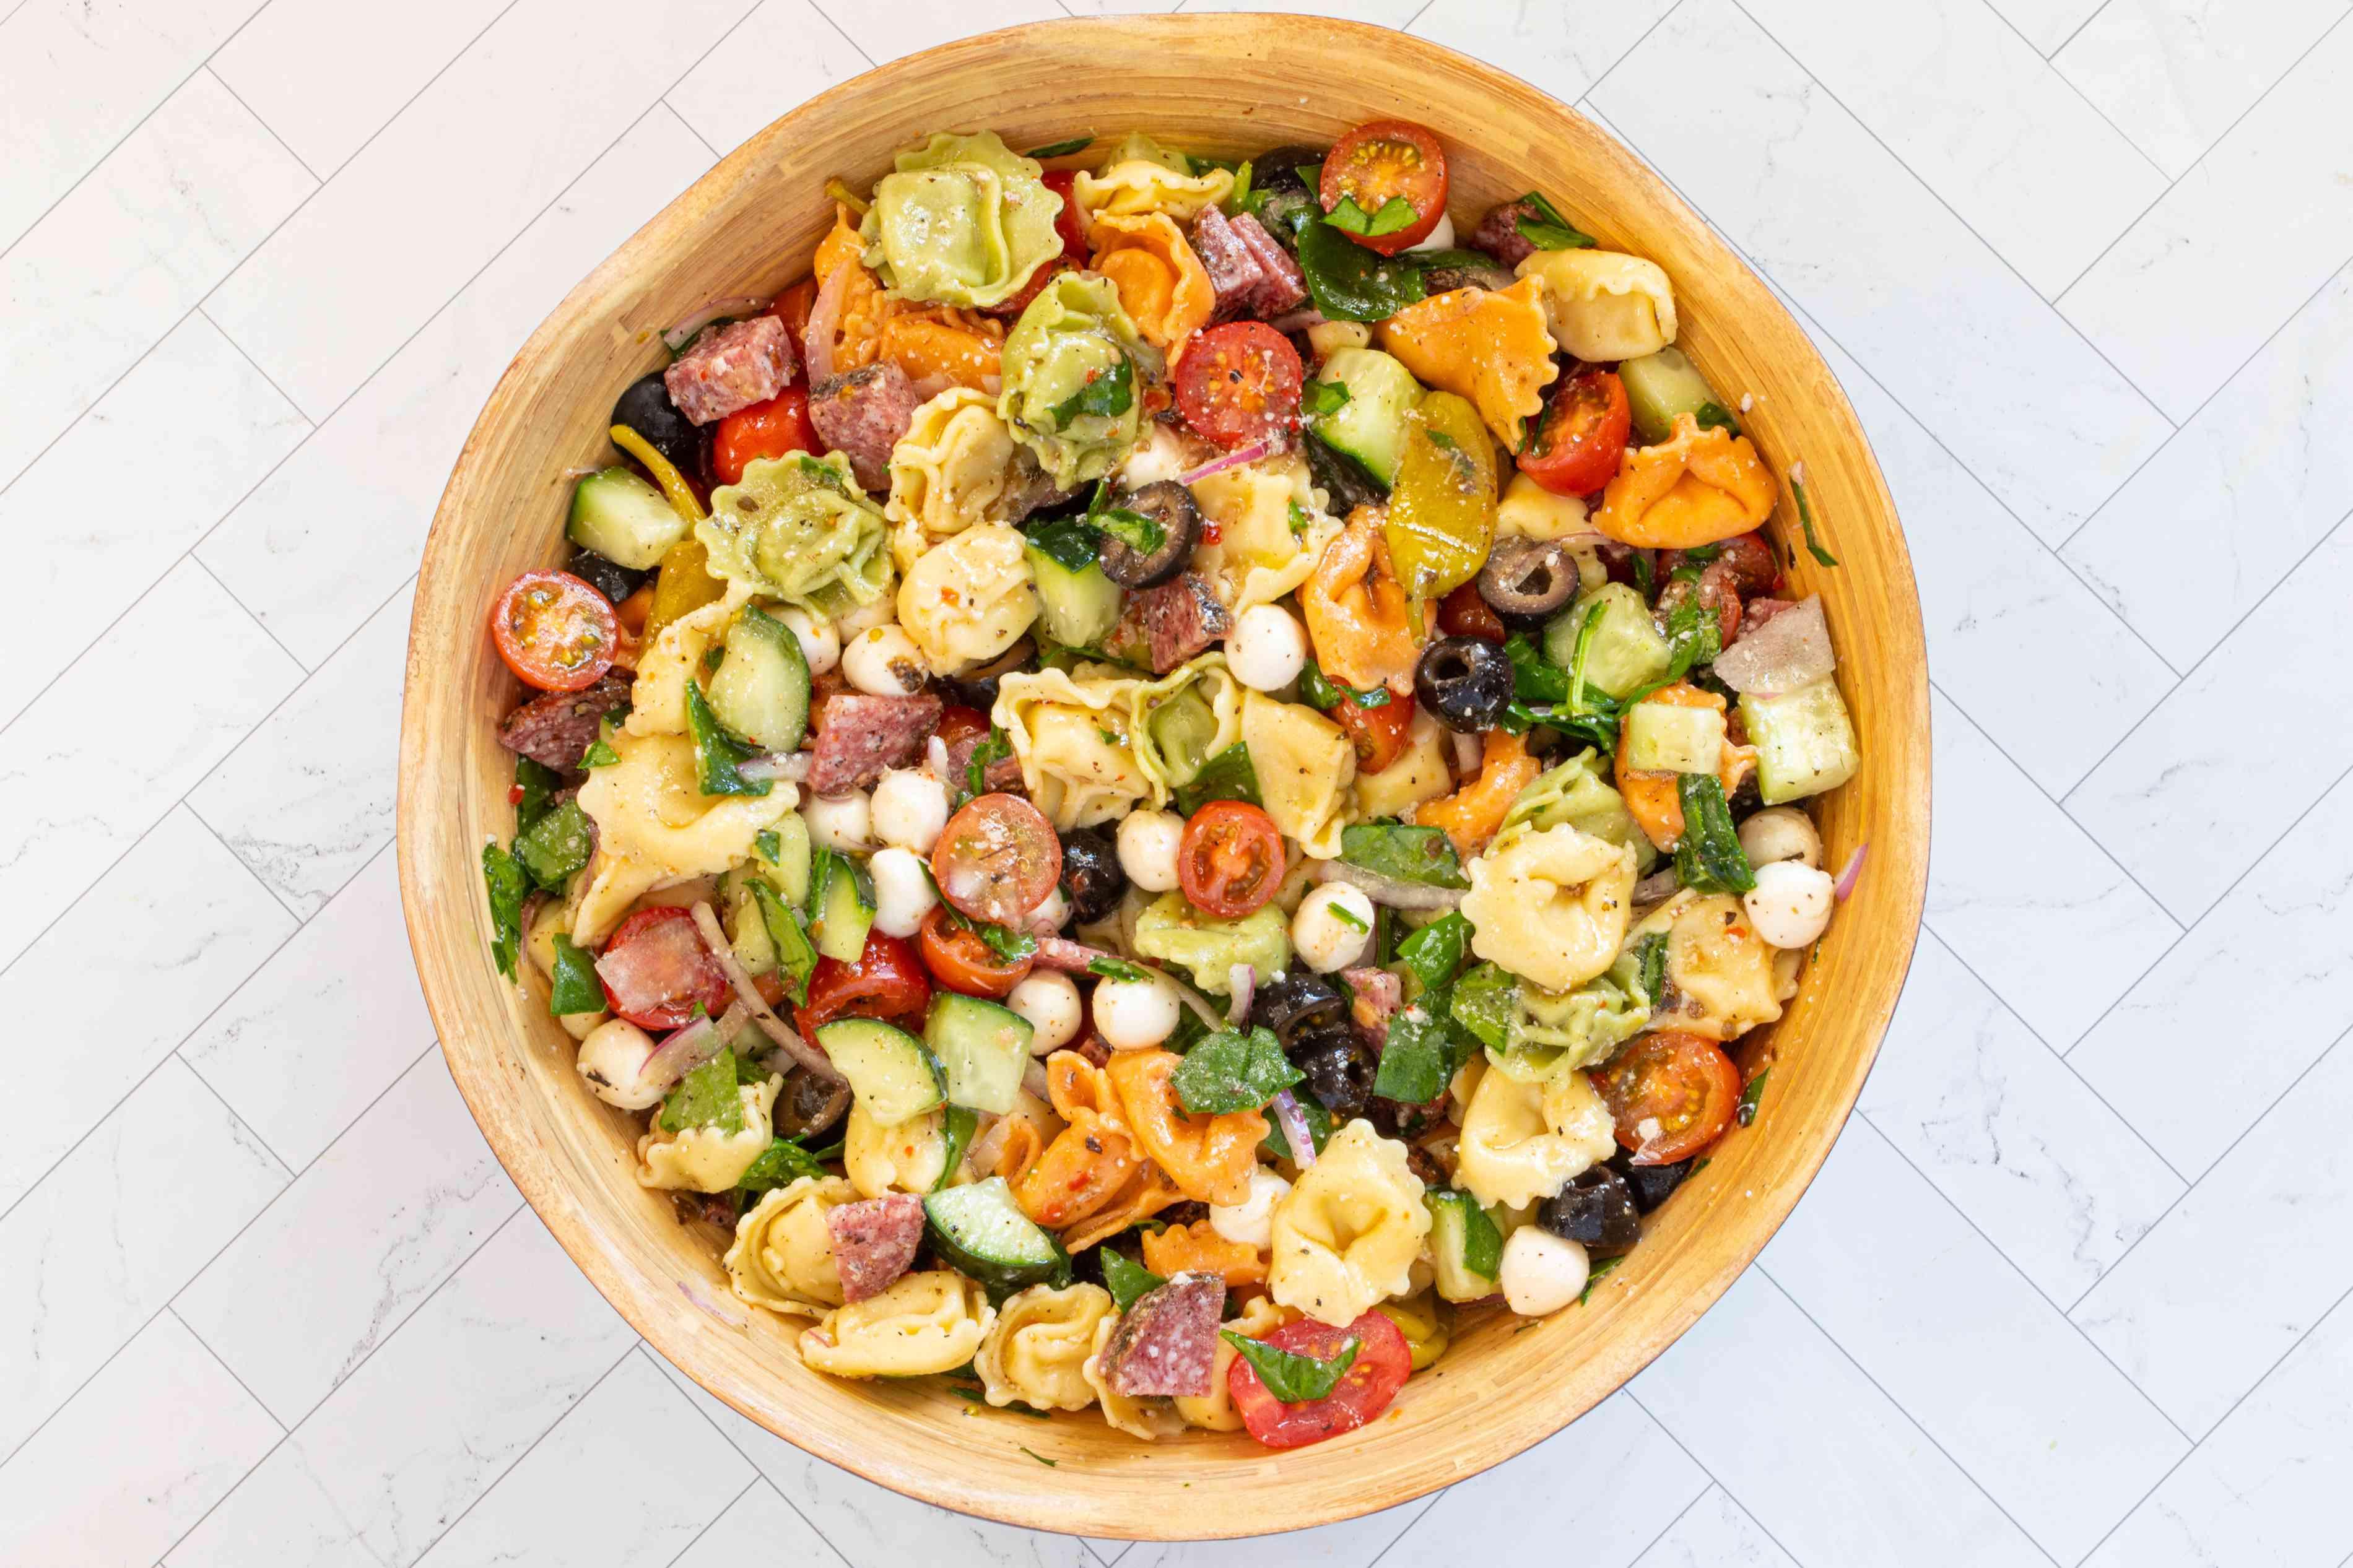 tortellini pasta salad in a serving bowl